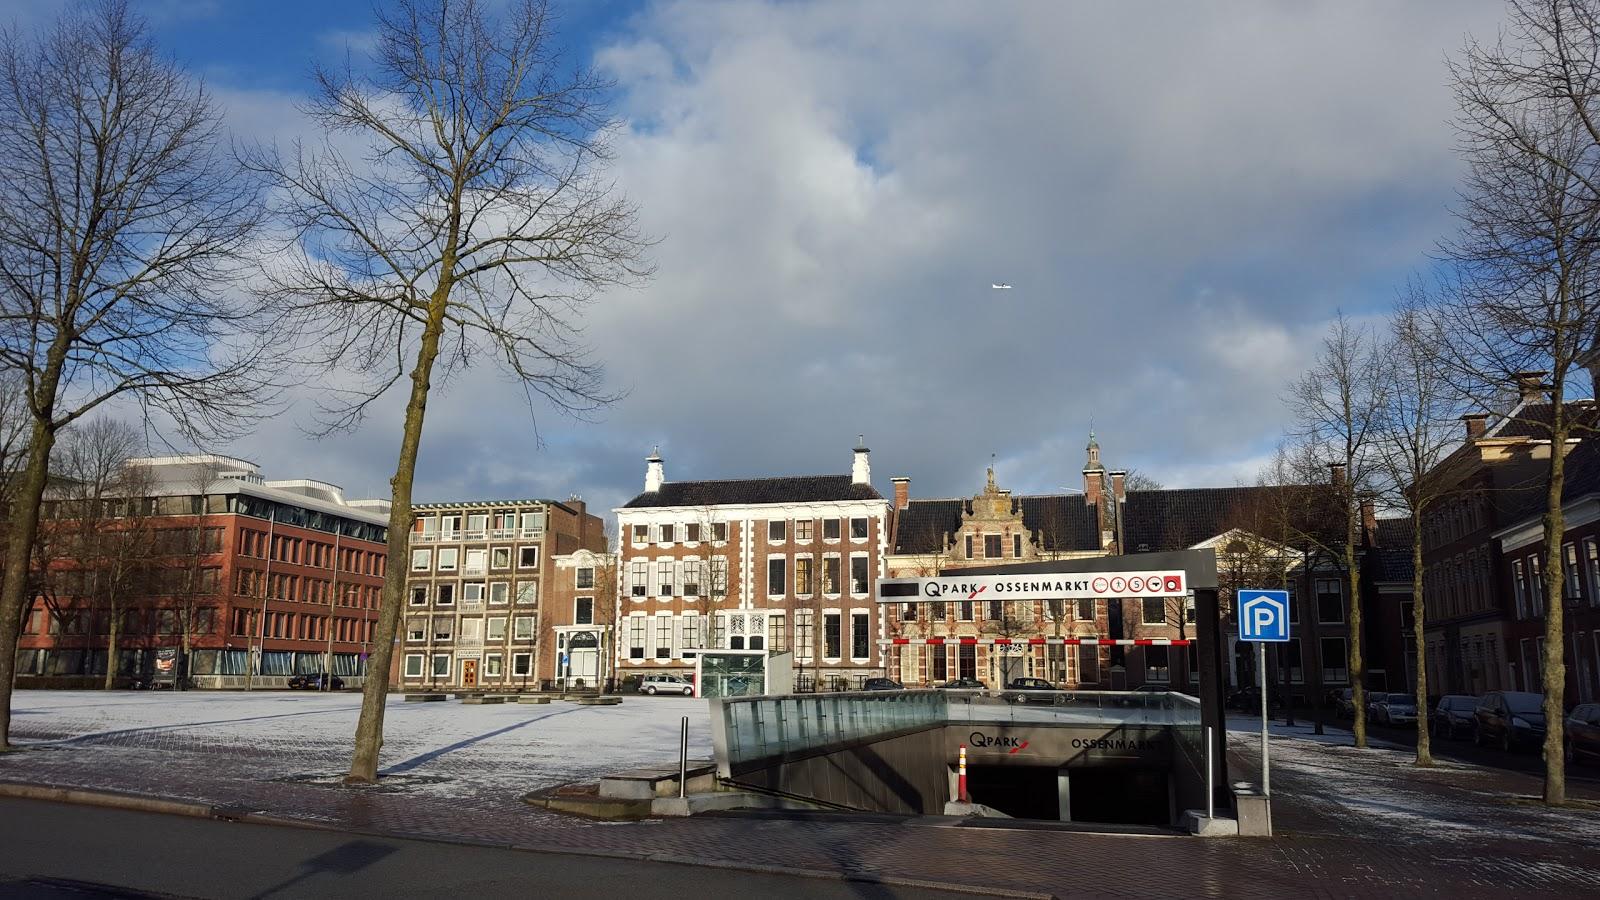 Q Park Ossenmarkt Groningen accepteert American Express Credit Cards